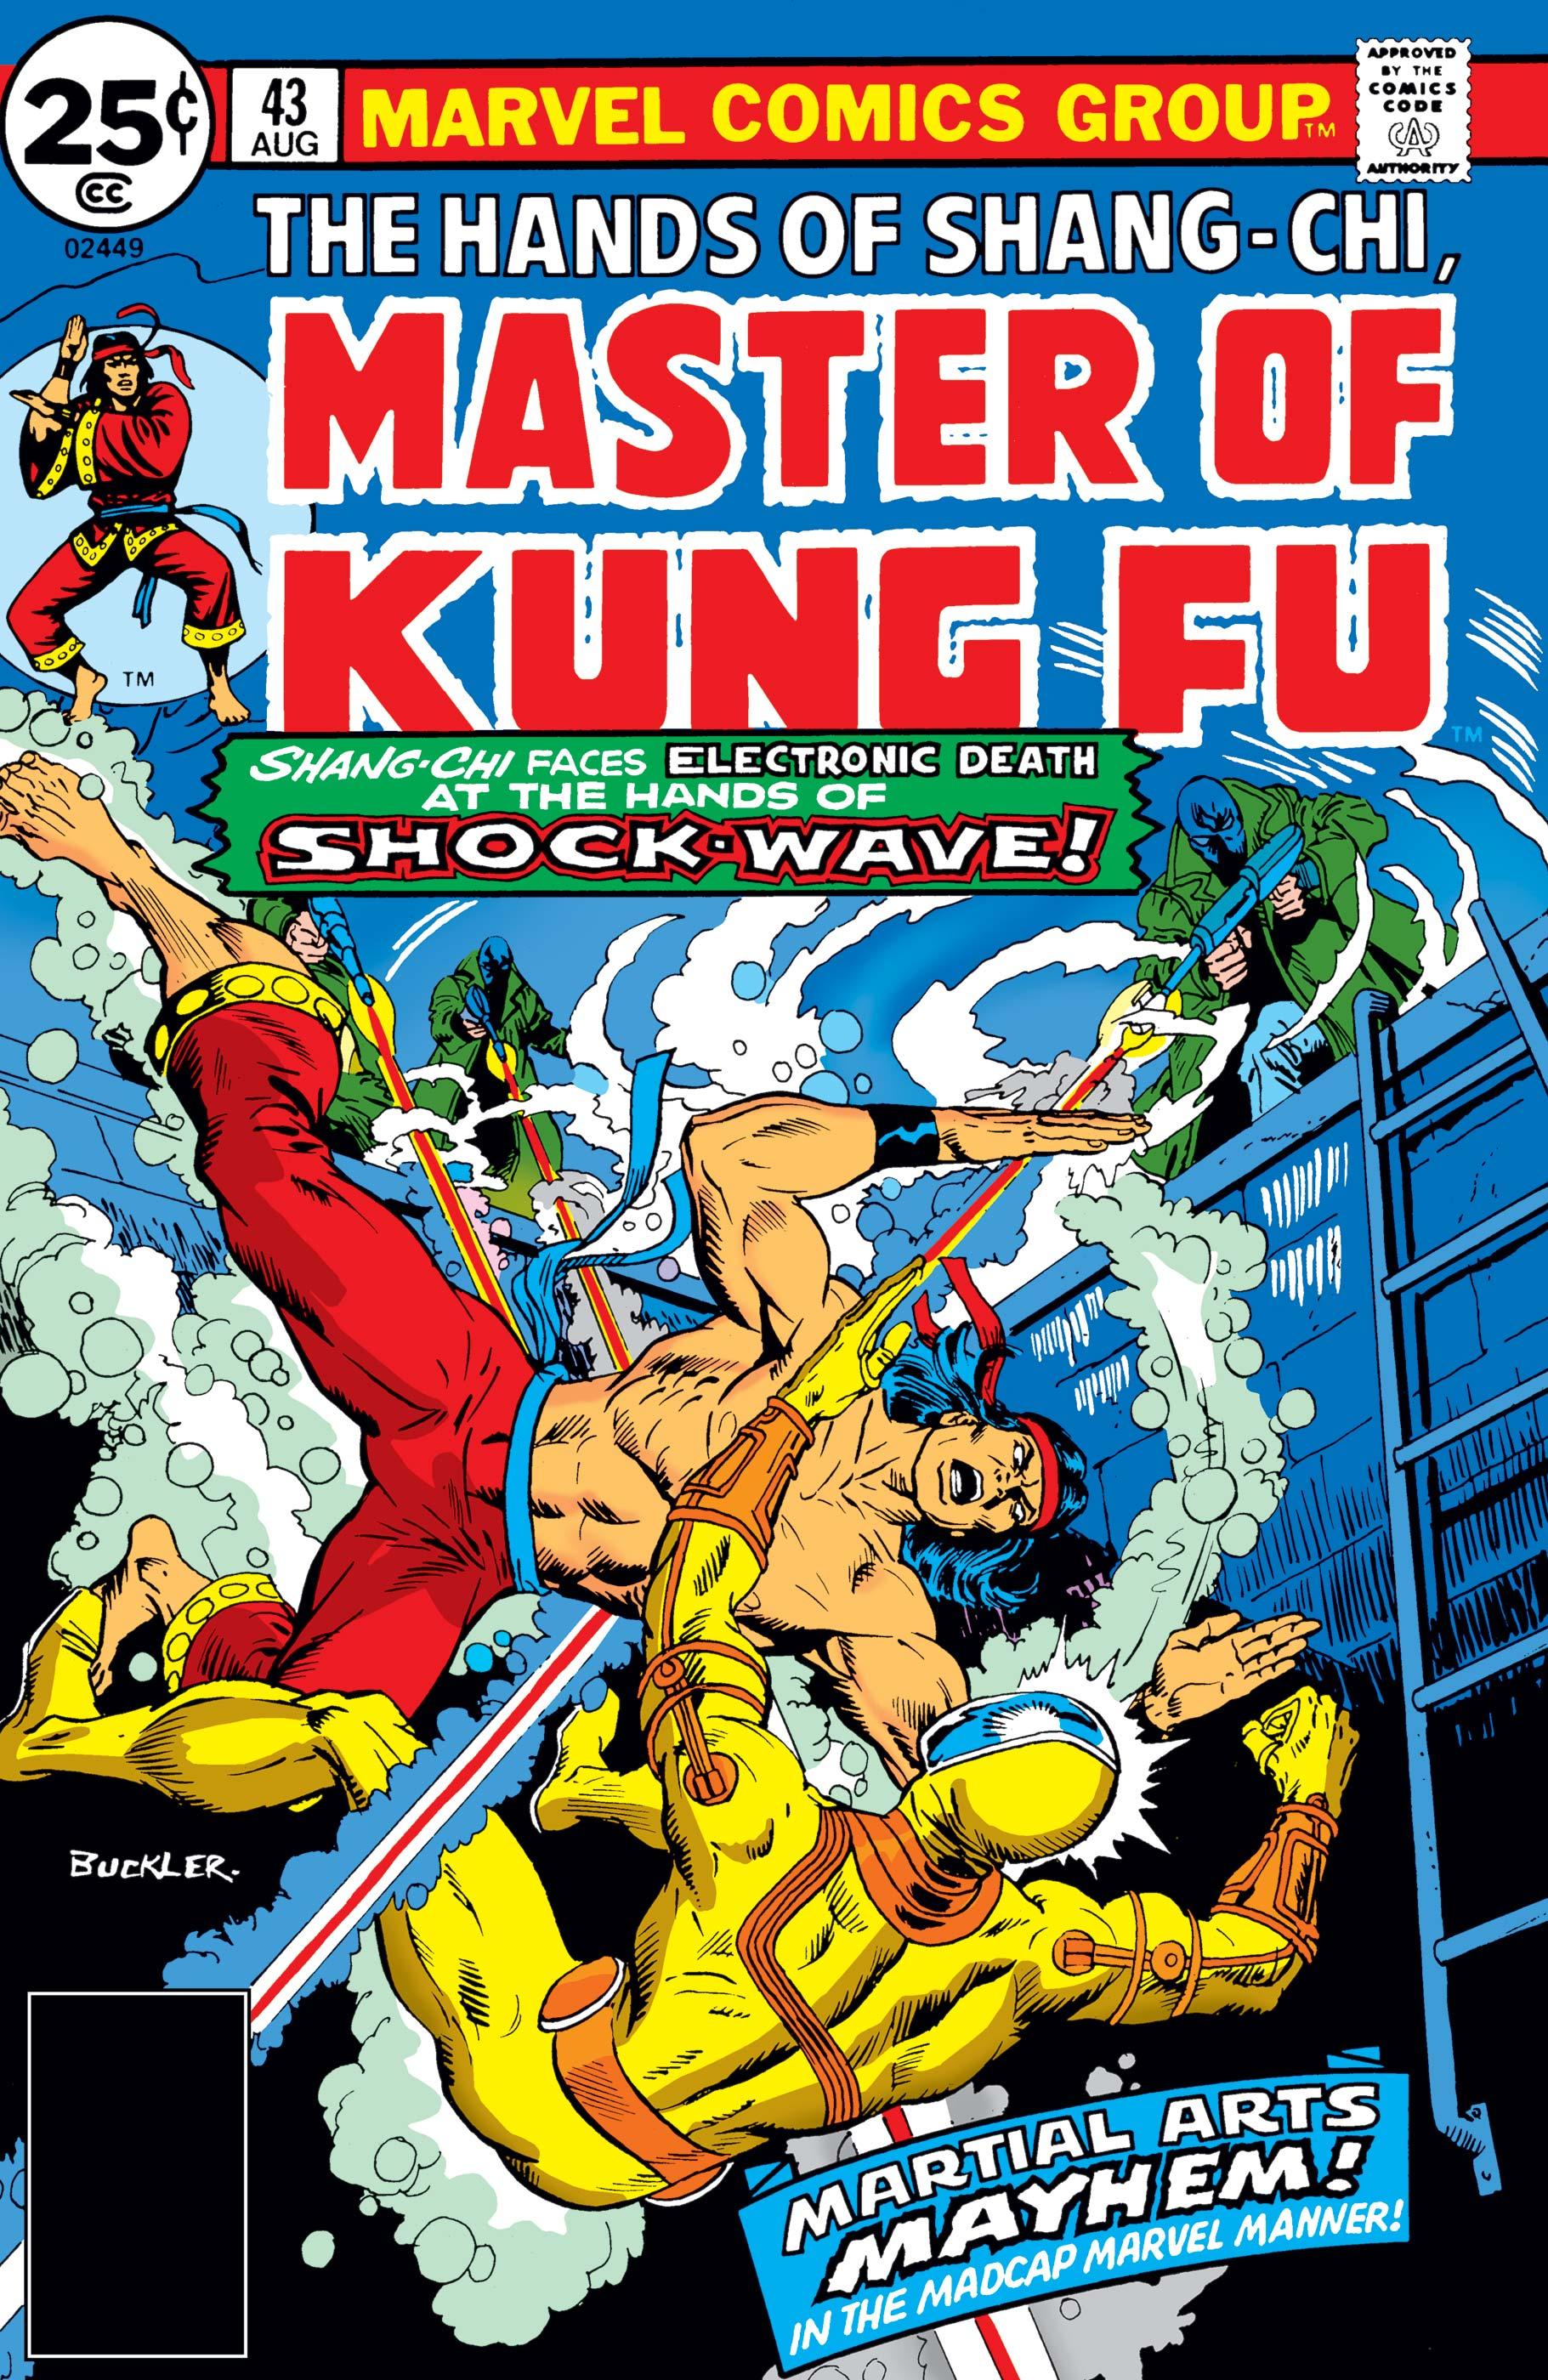 Master of Kung Fu (1974) #43